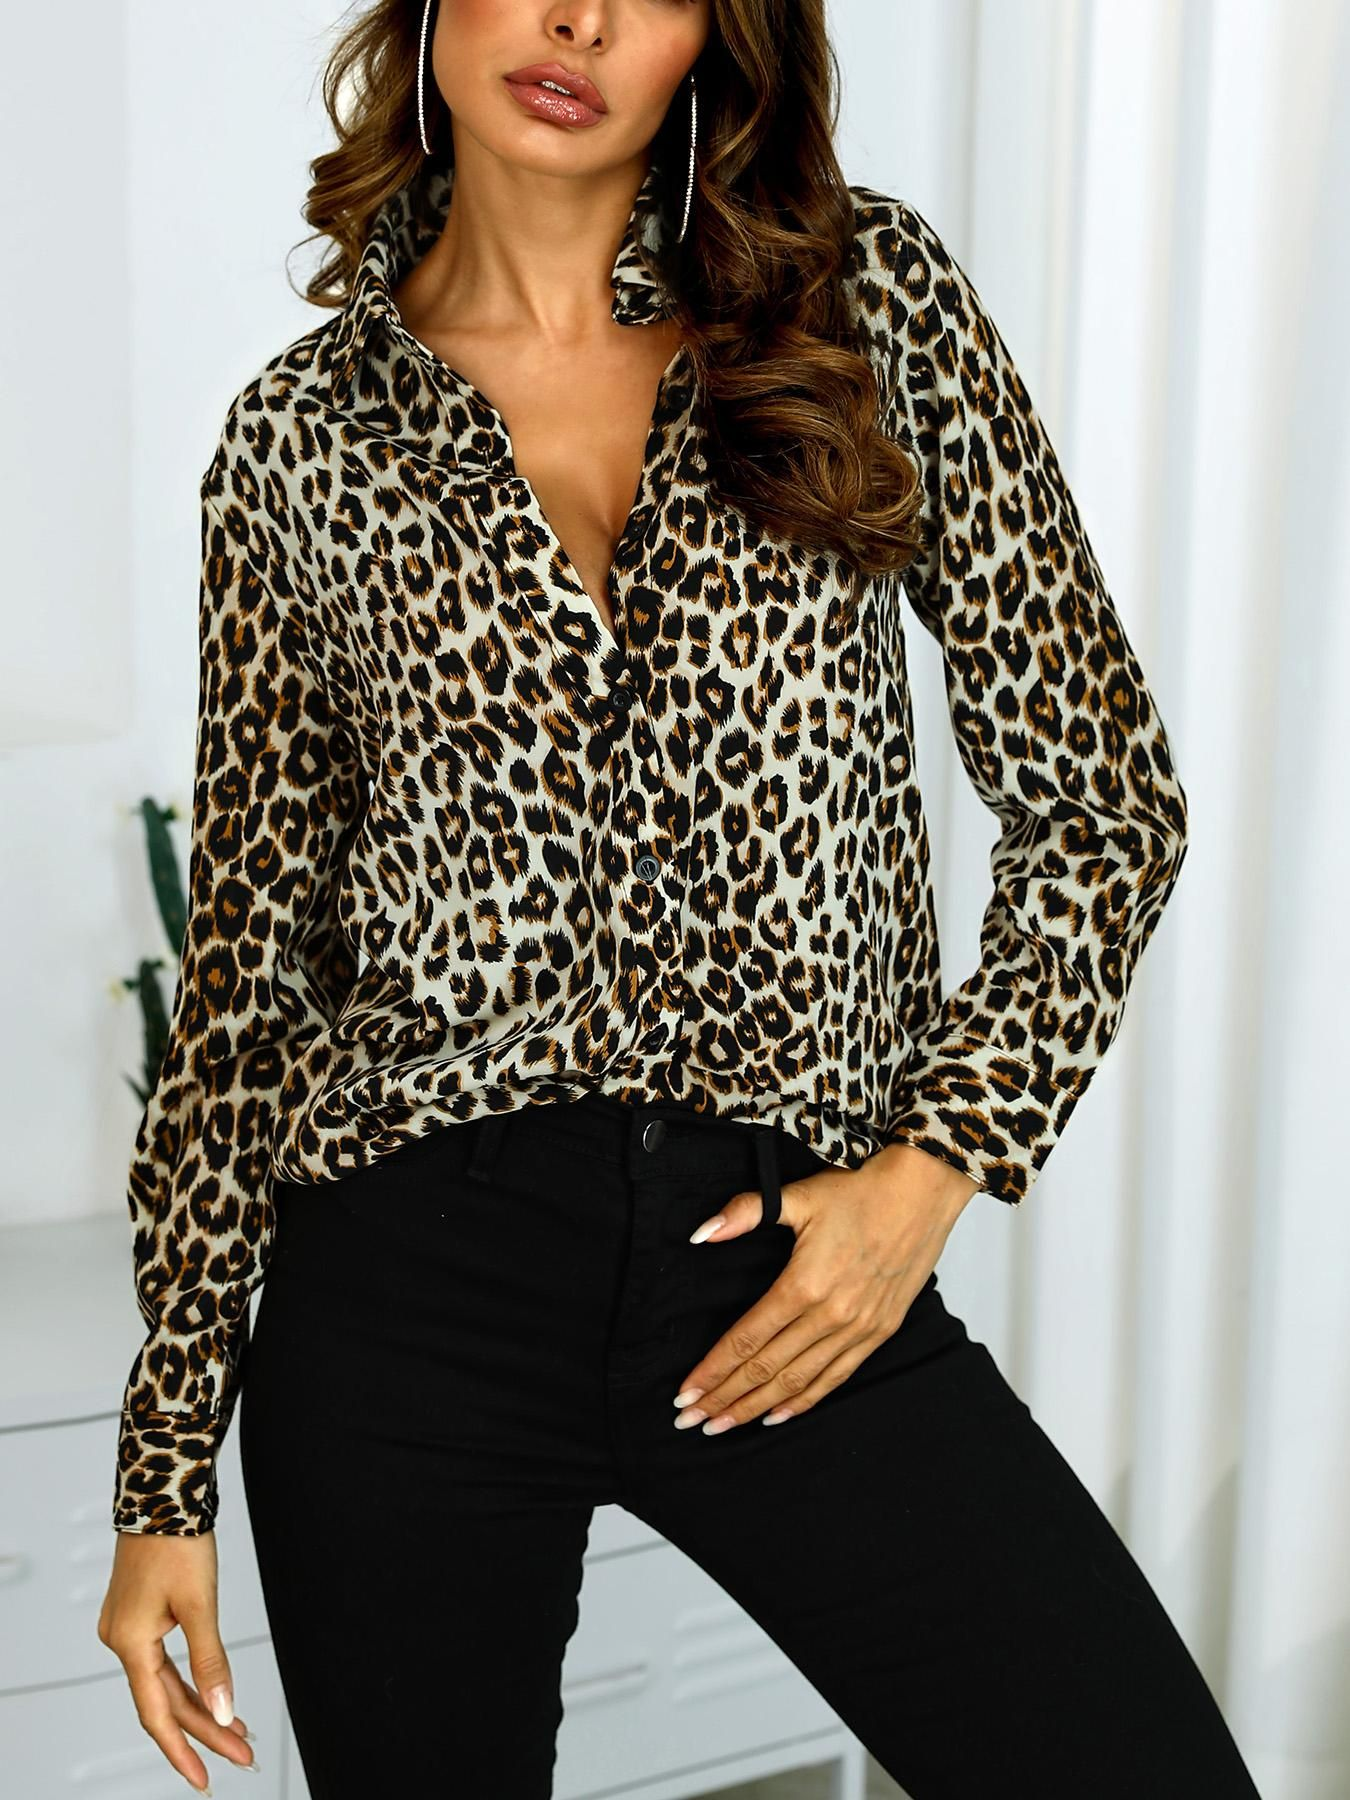 Long Sleeve Leopard Print Casual Shirt Casual Shirts Printed Shirt Outfit Casual Shirt Women [ 1800 x 1350 Pixel ]